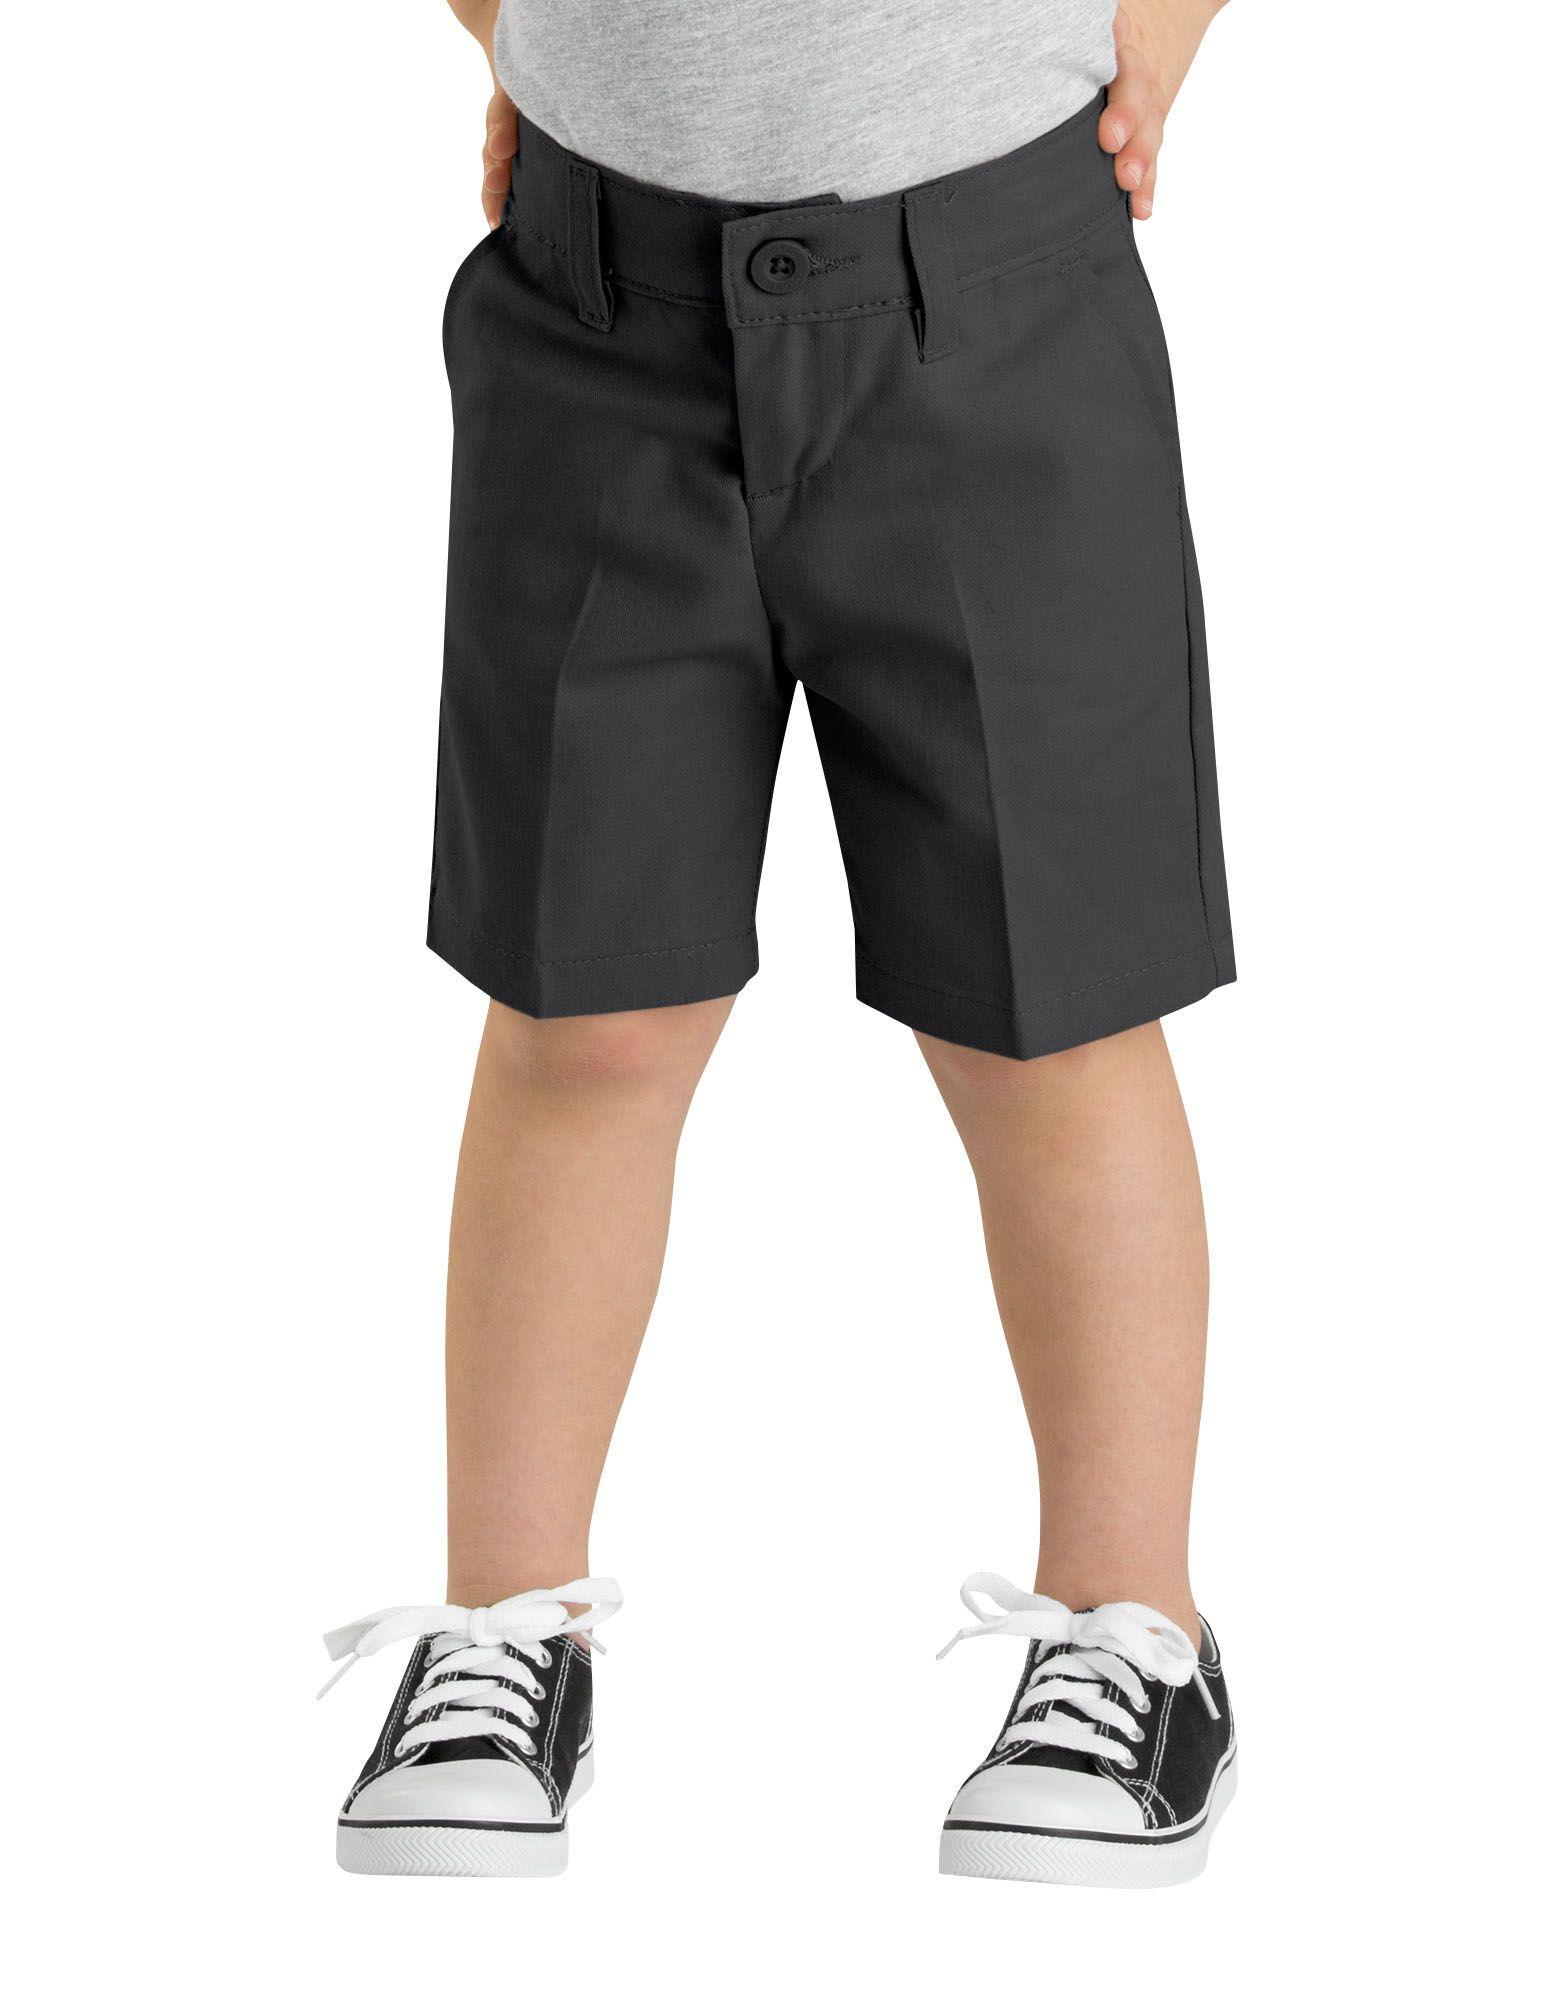 Girls FlexWaist® Slim Fit Flat Front Shorts, 4-6x-DK